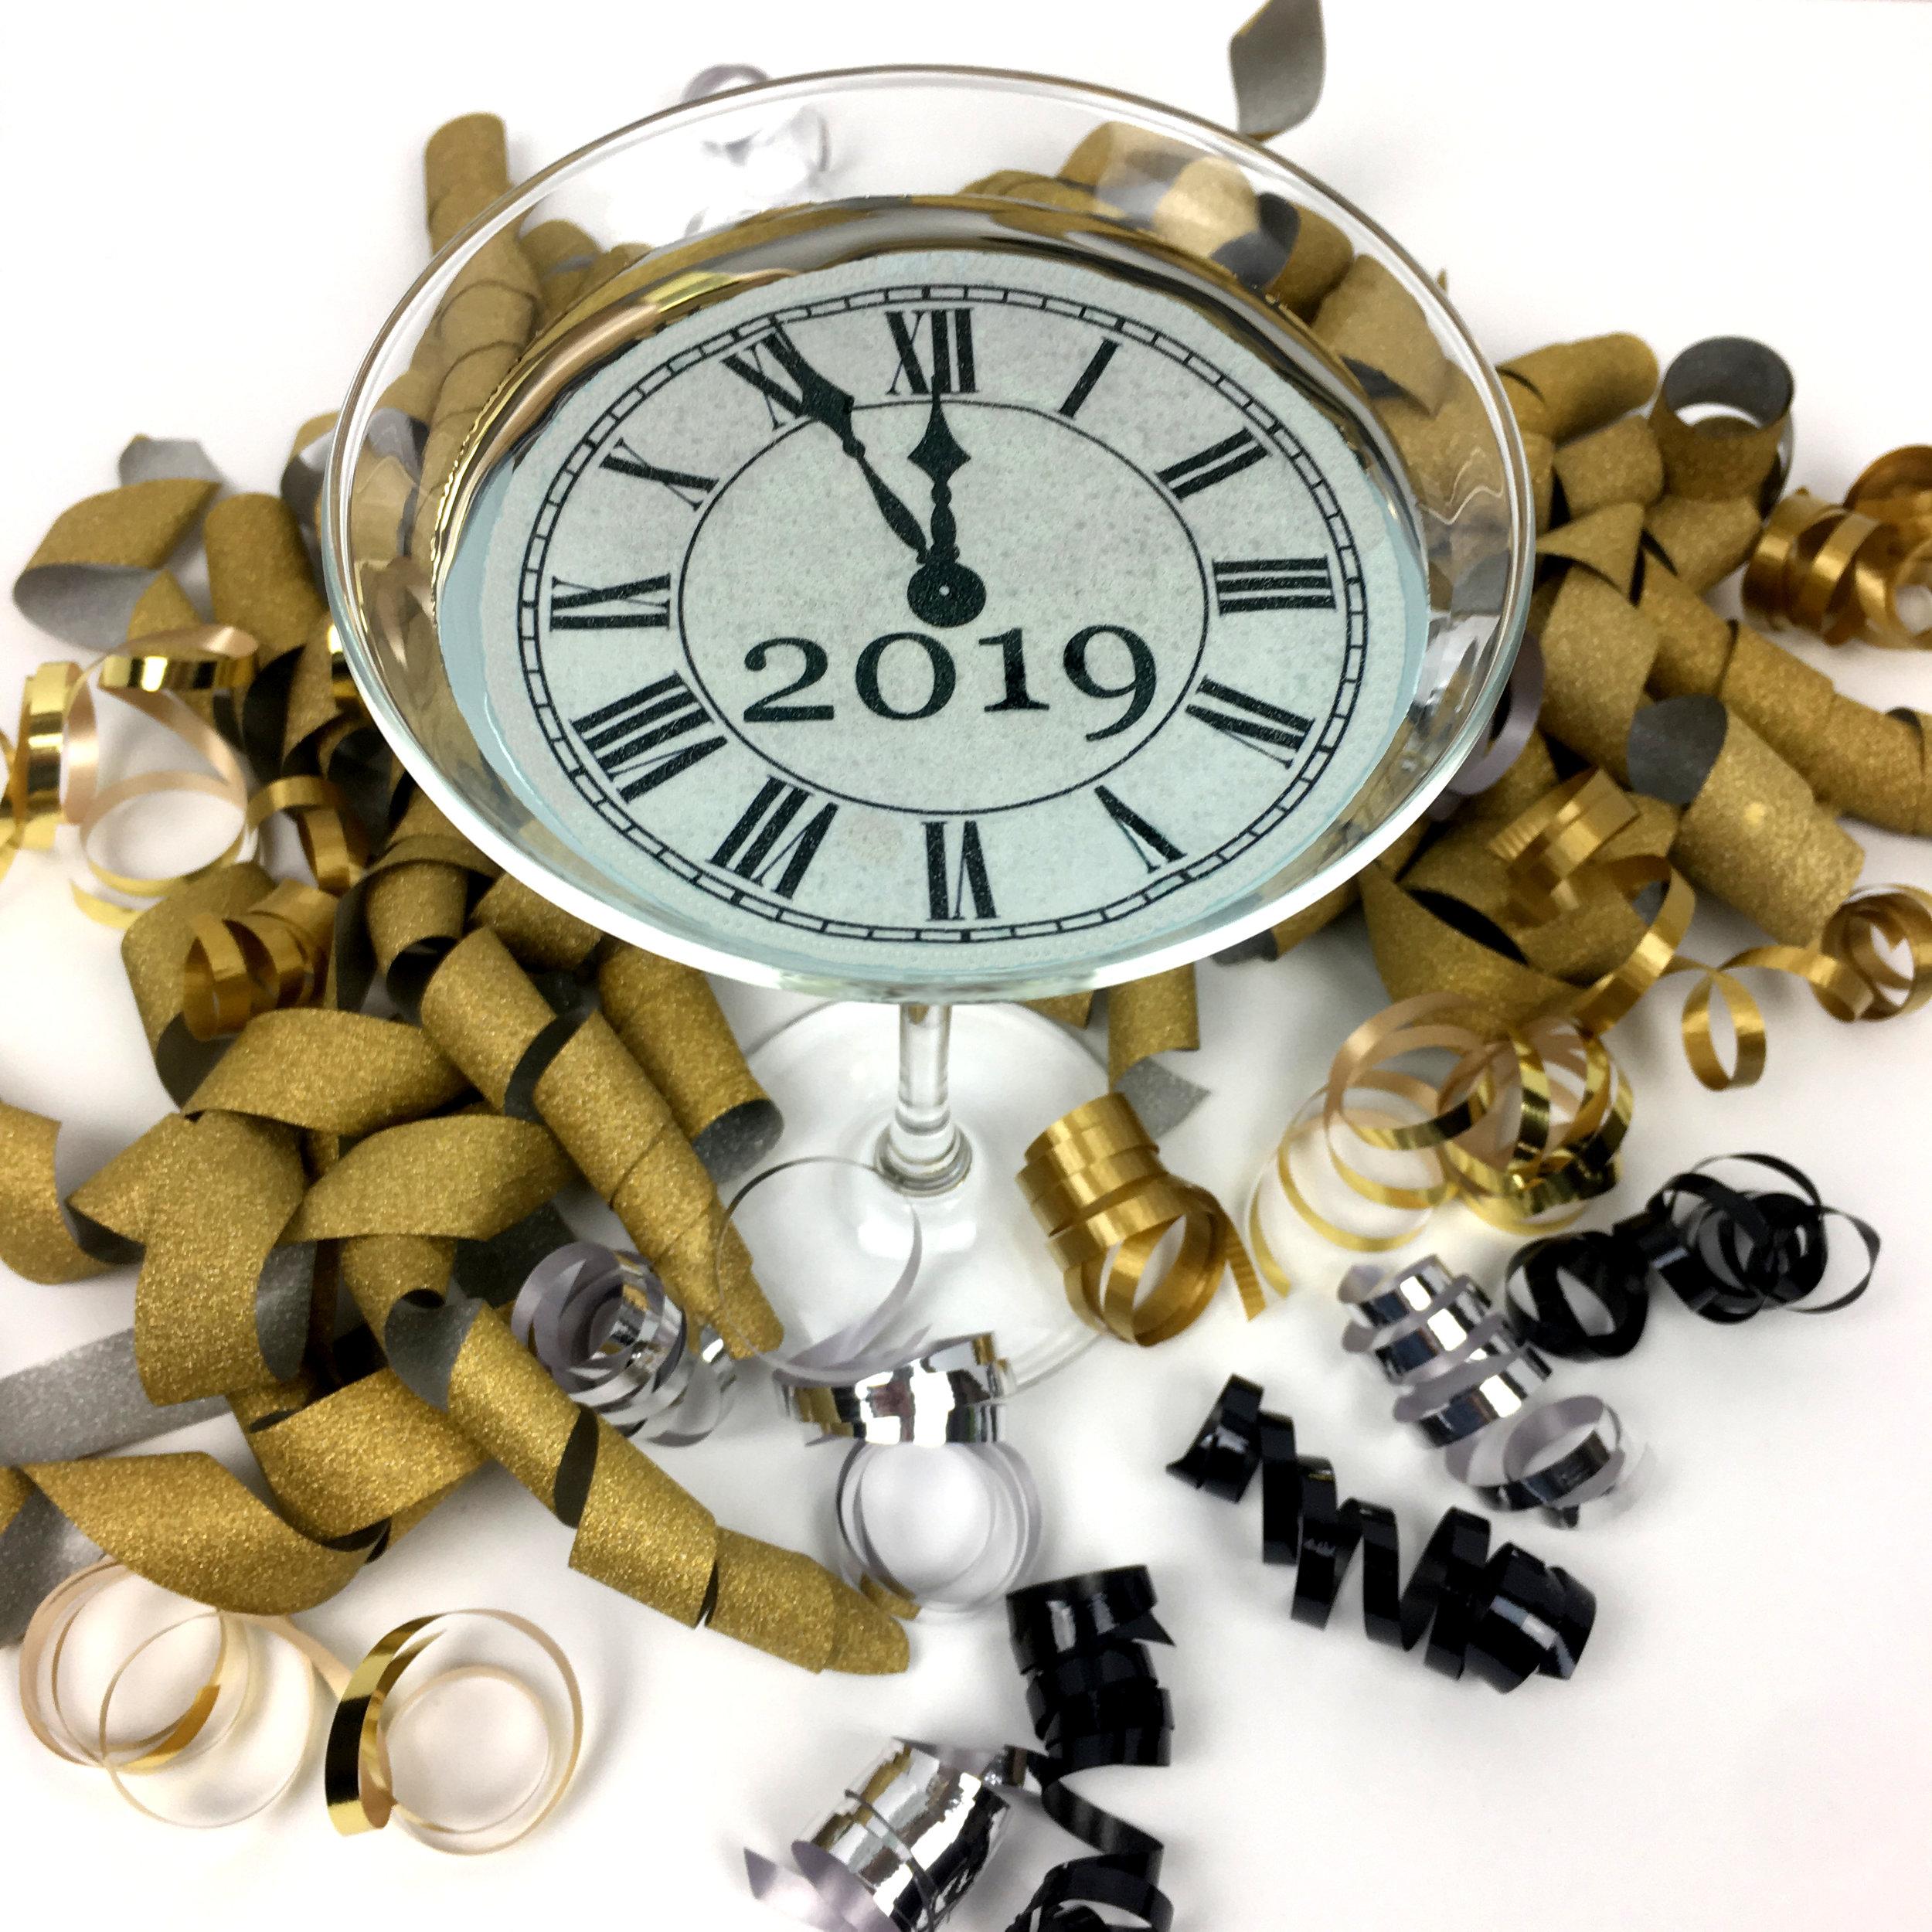 2019 clock.jpg